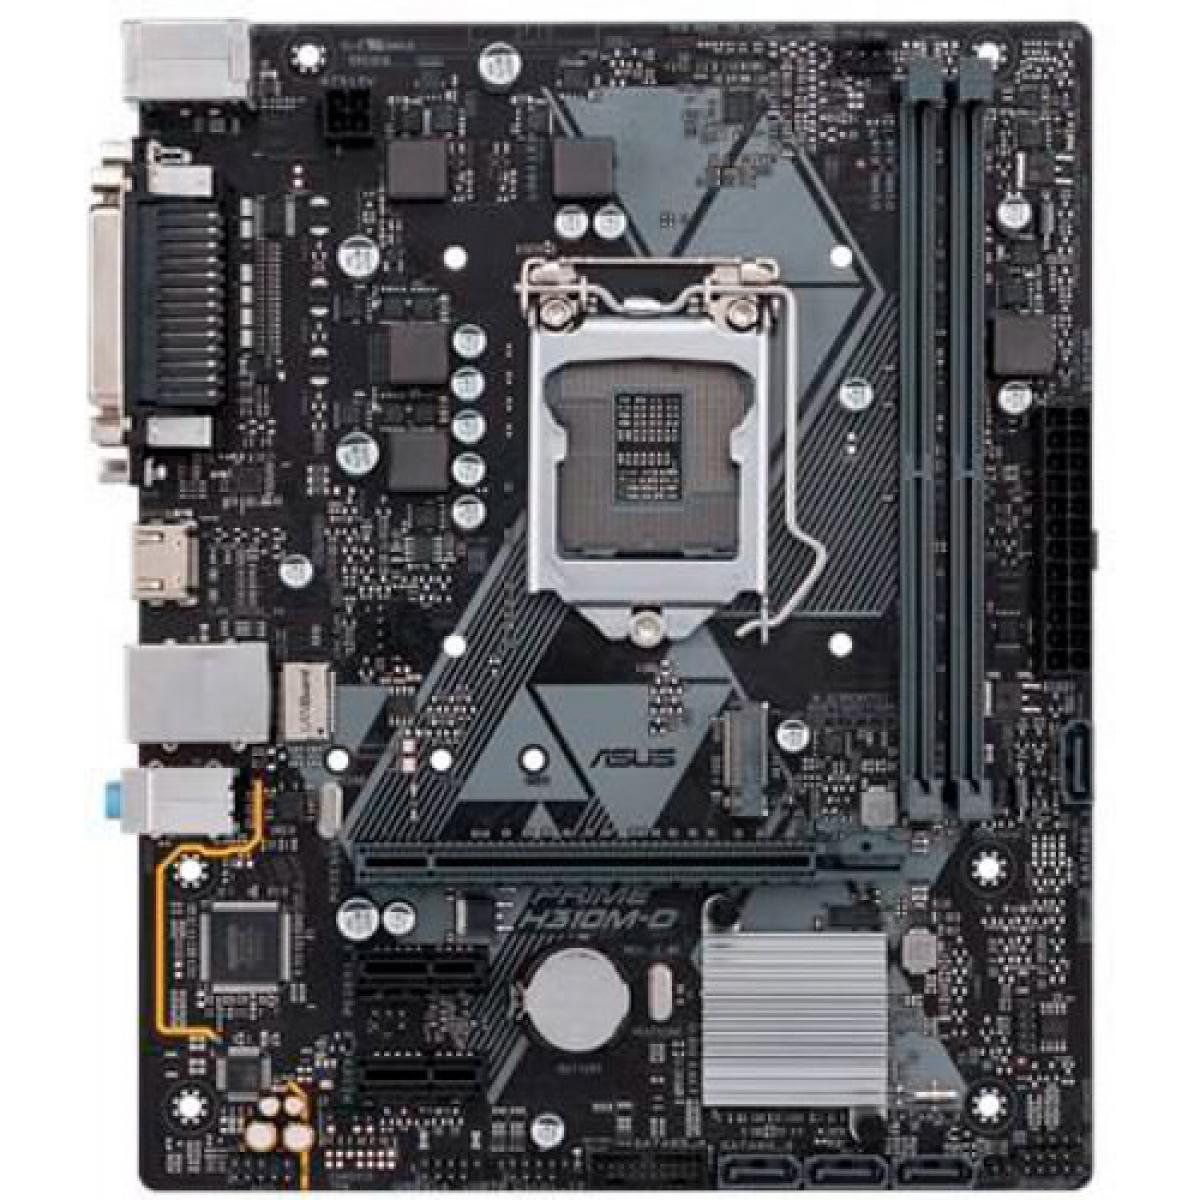 Placa Mãe Asus Prime H310M-D, Chipset H310, Intel LGA 1151, mATX, DDR4